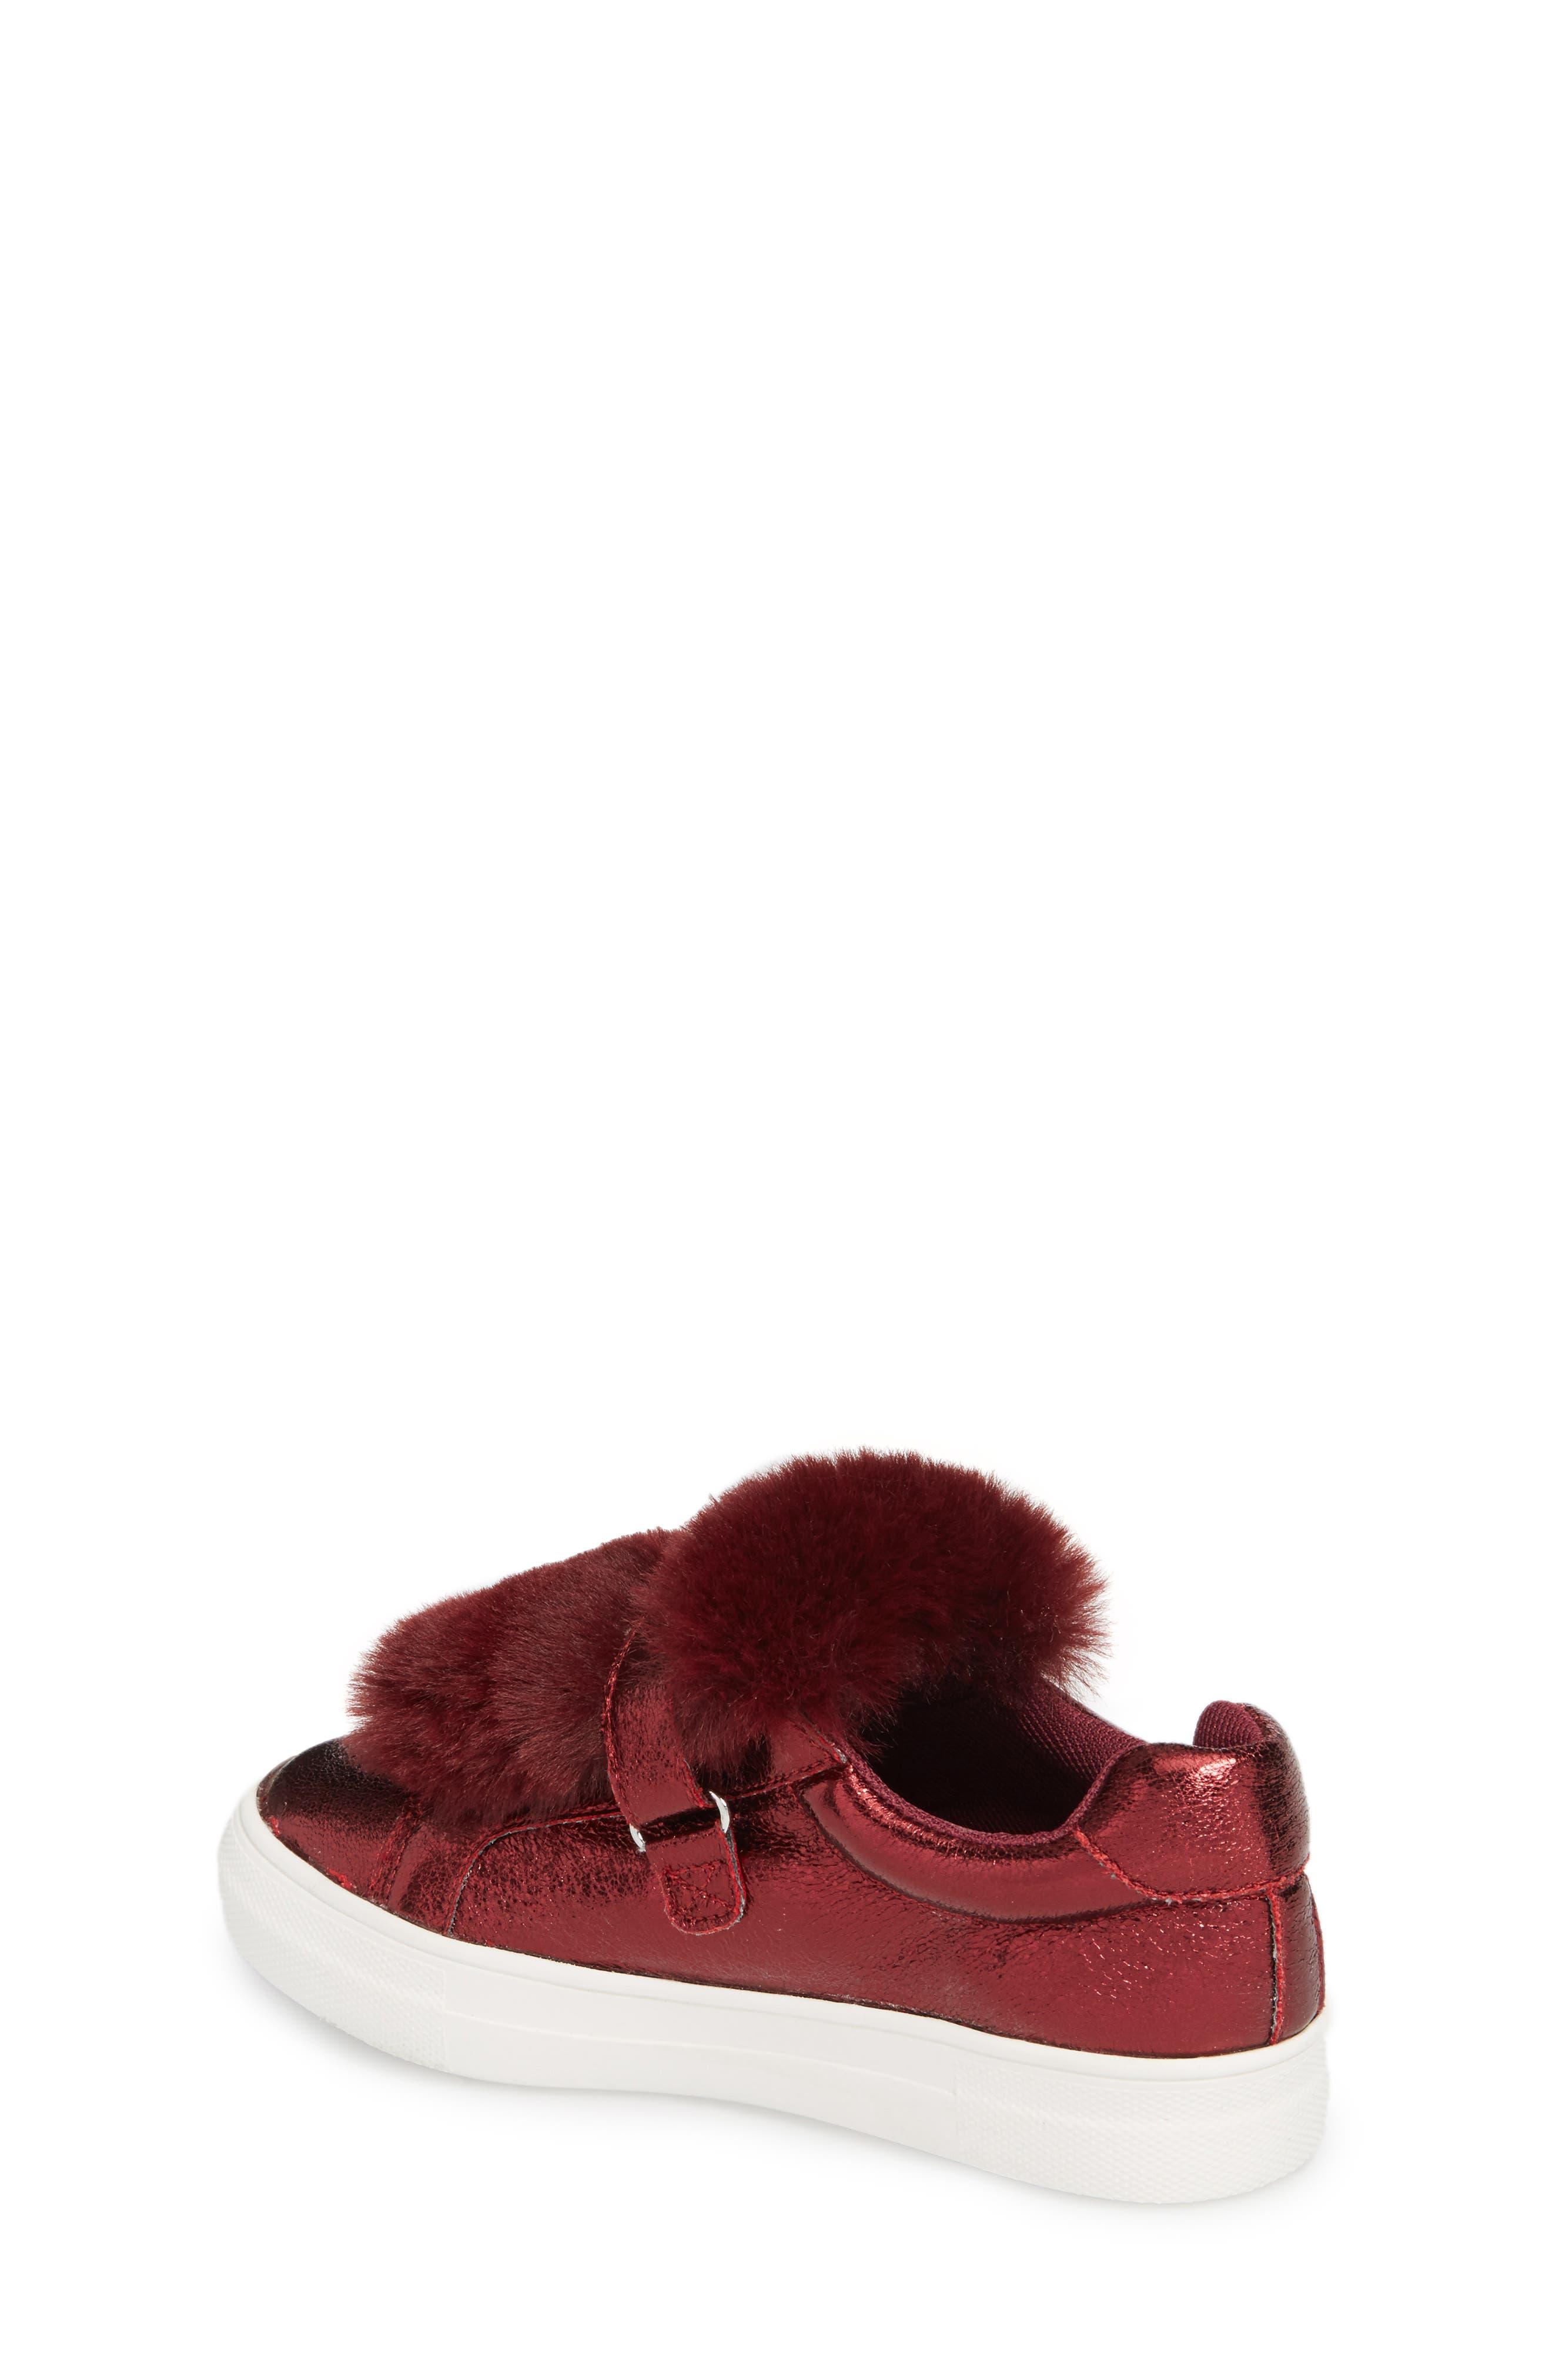 Zandra Faux Fur Metallic Sneaker,                             Alternate thumbnail 2, color,